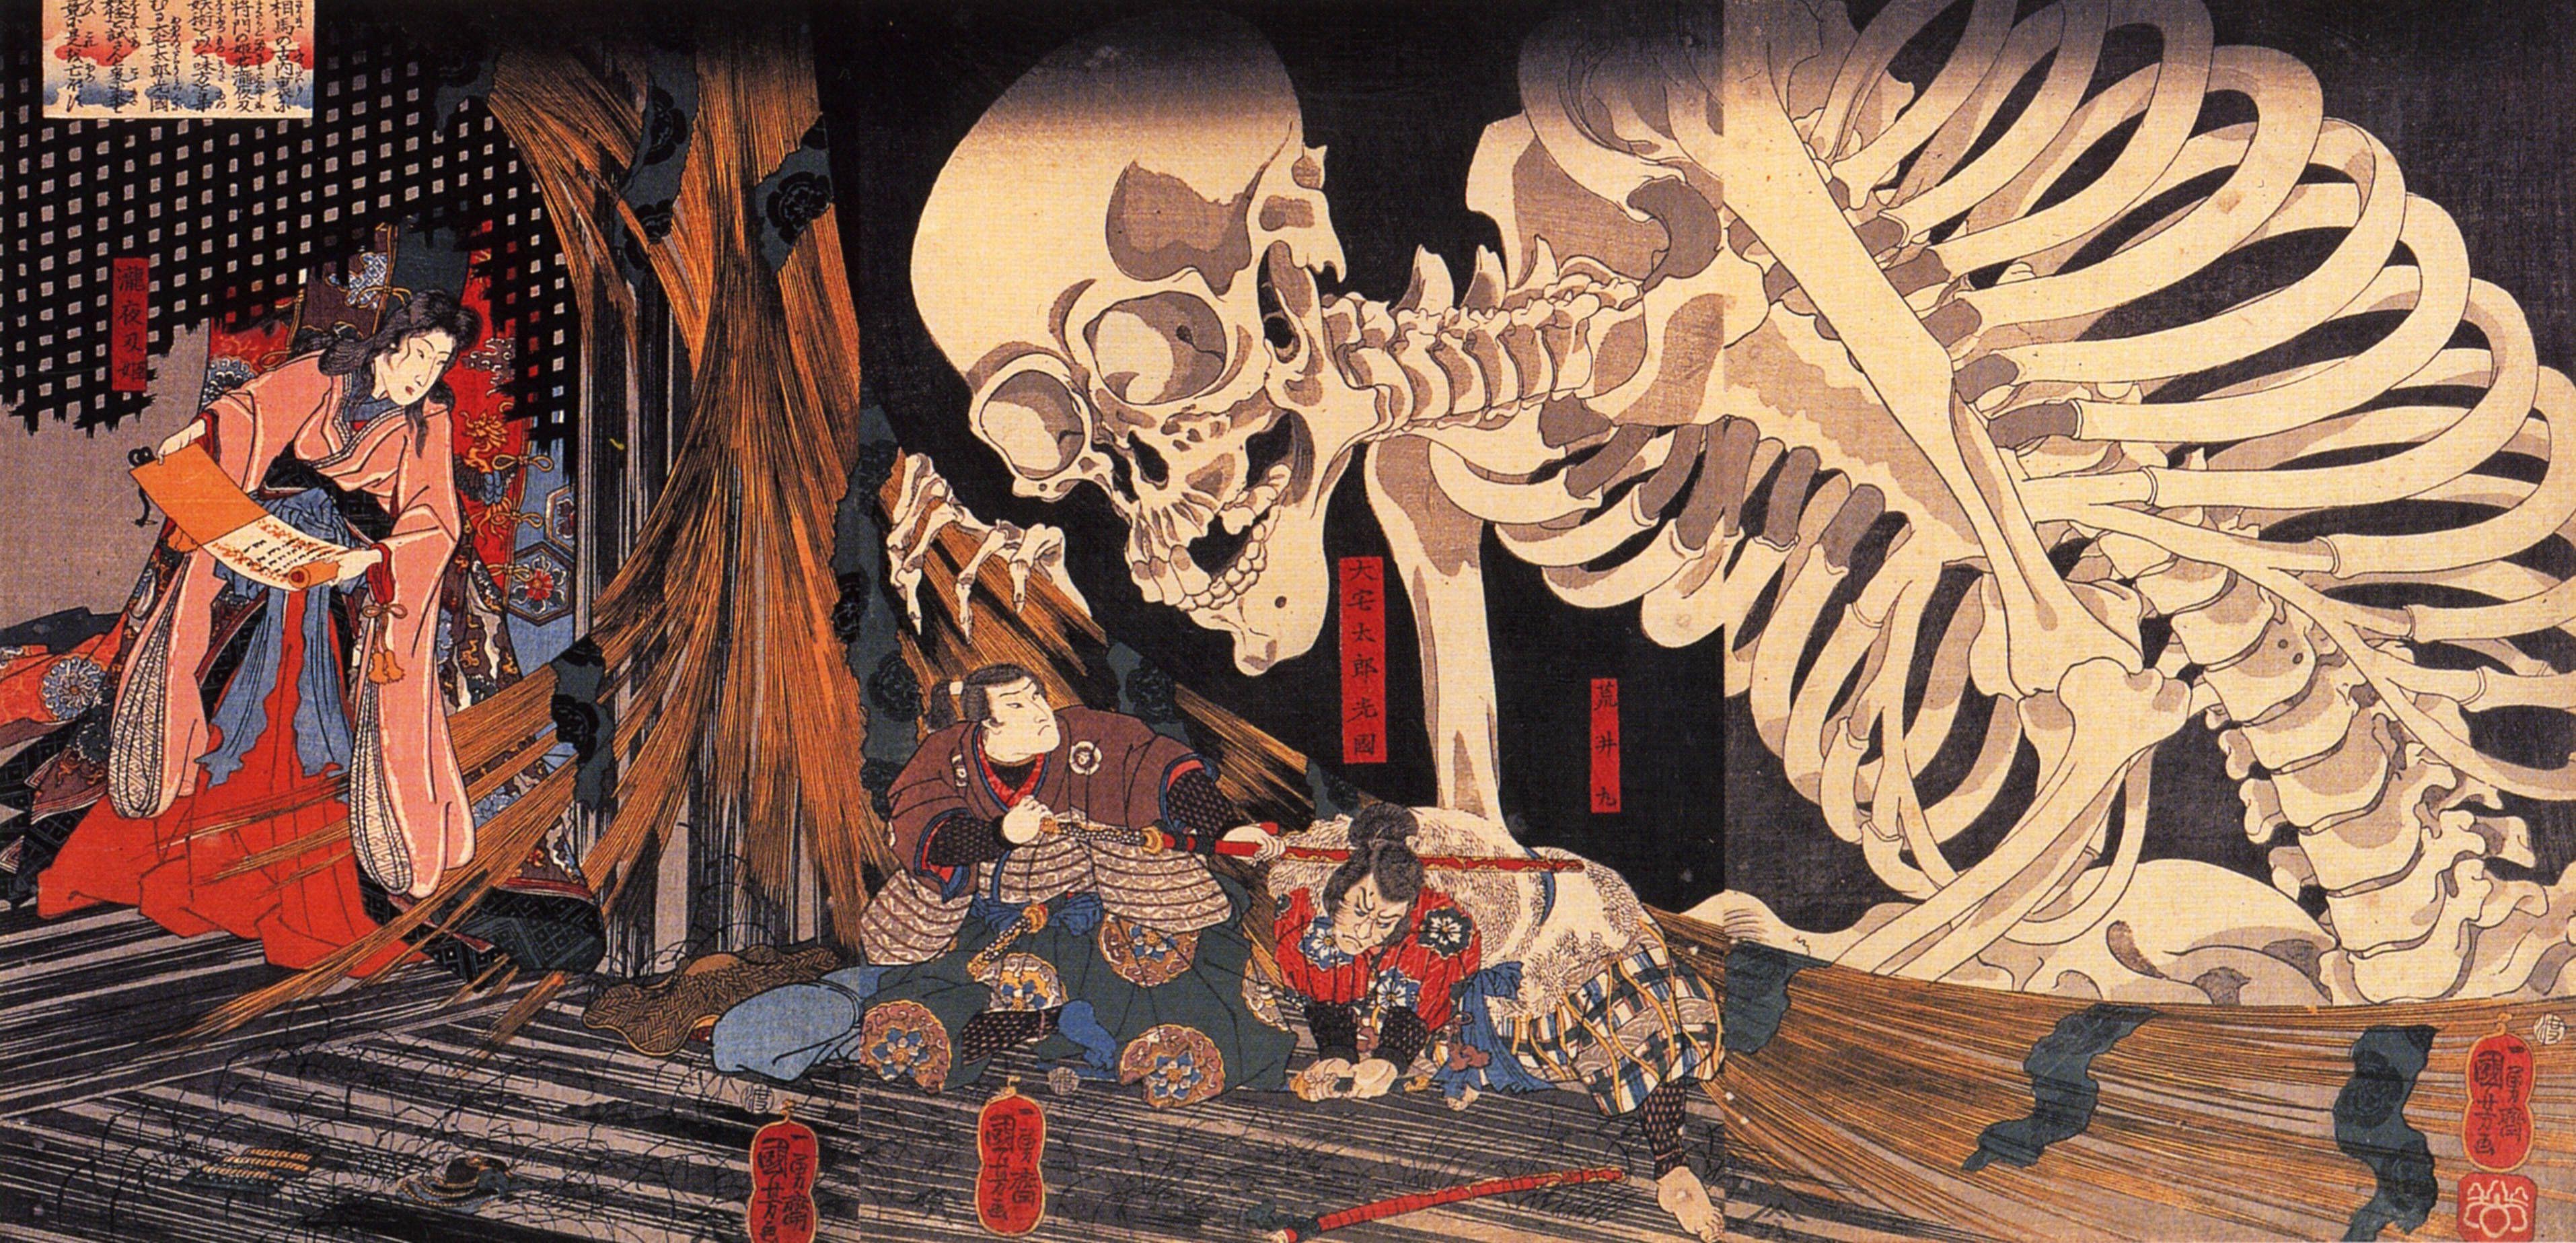 Utagawa Kuniyoshi Giclee Canvas Print Paintings Poster Reproduction Copy